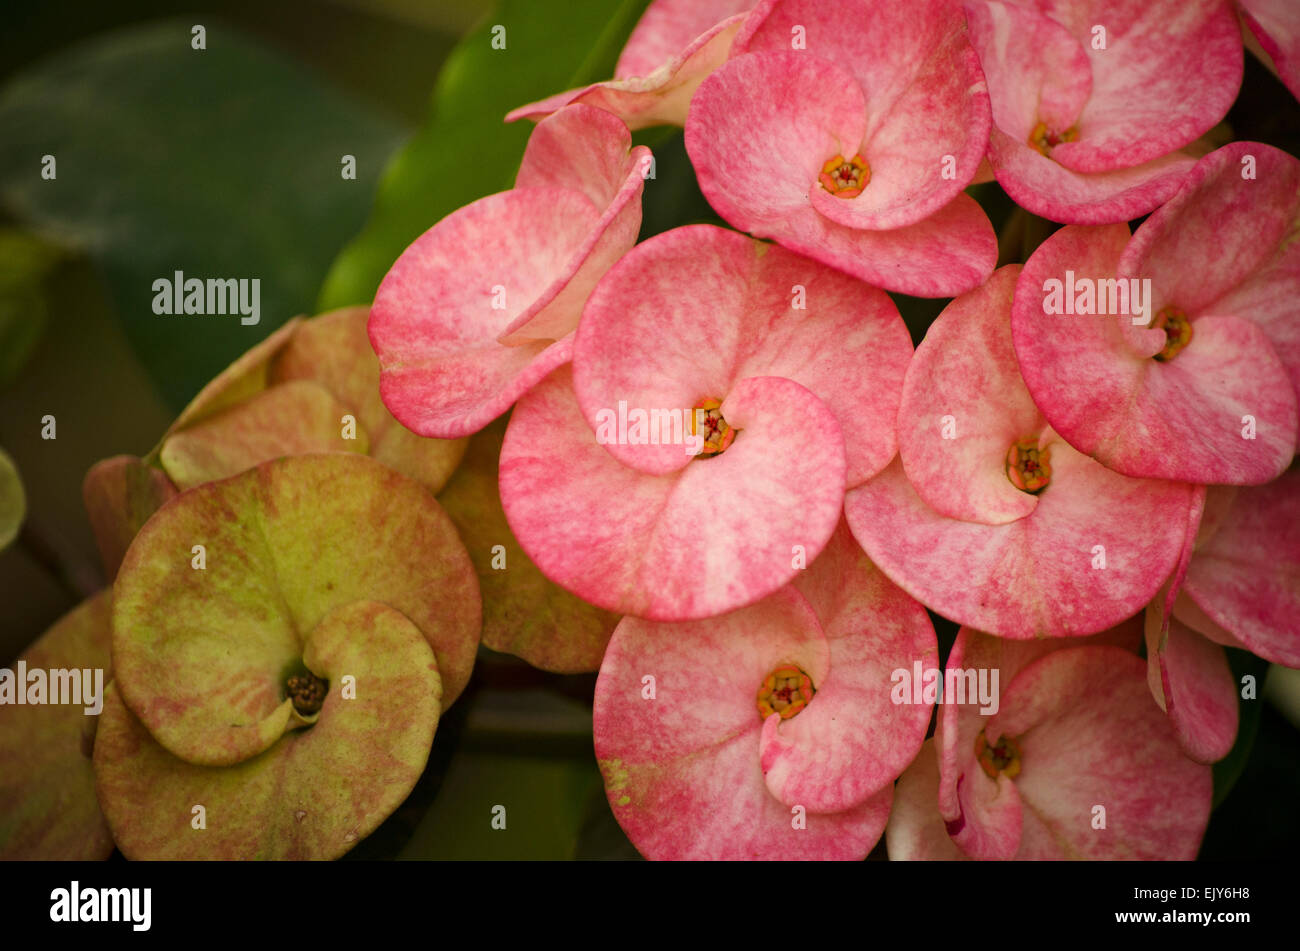 Flowers of tamil nadu stock photos flowers of tamil nadu stock yellow and pink euphorbia flower in a garden at chennaitamil naduindia izmirmasajfo